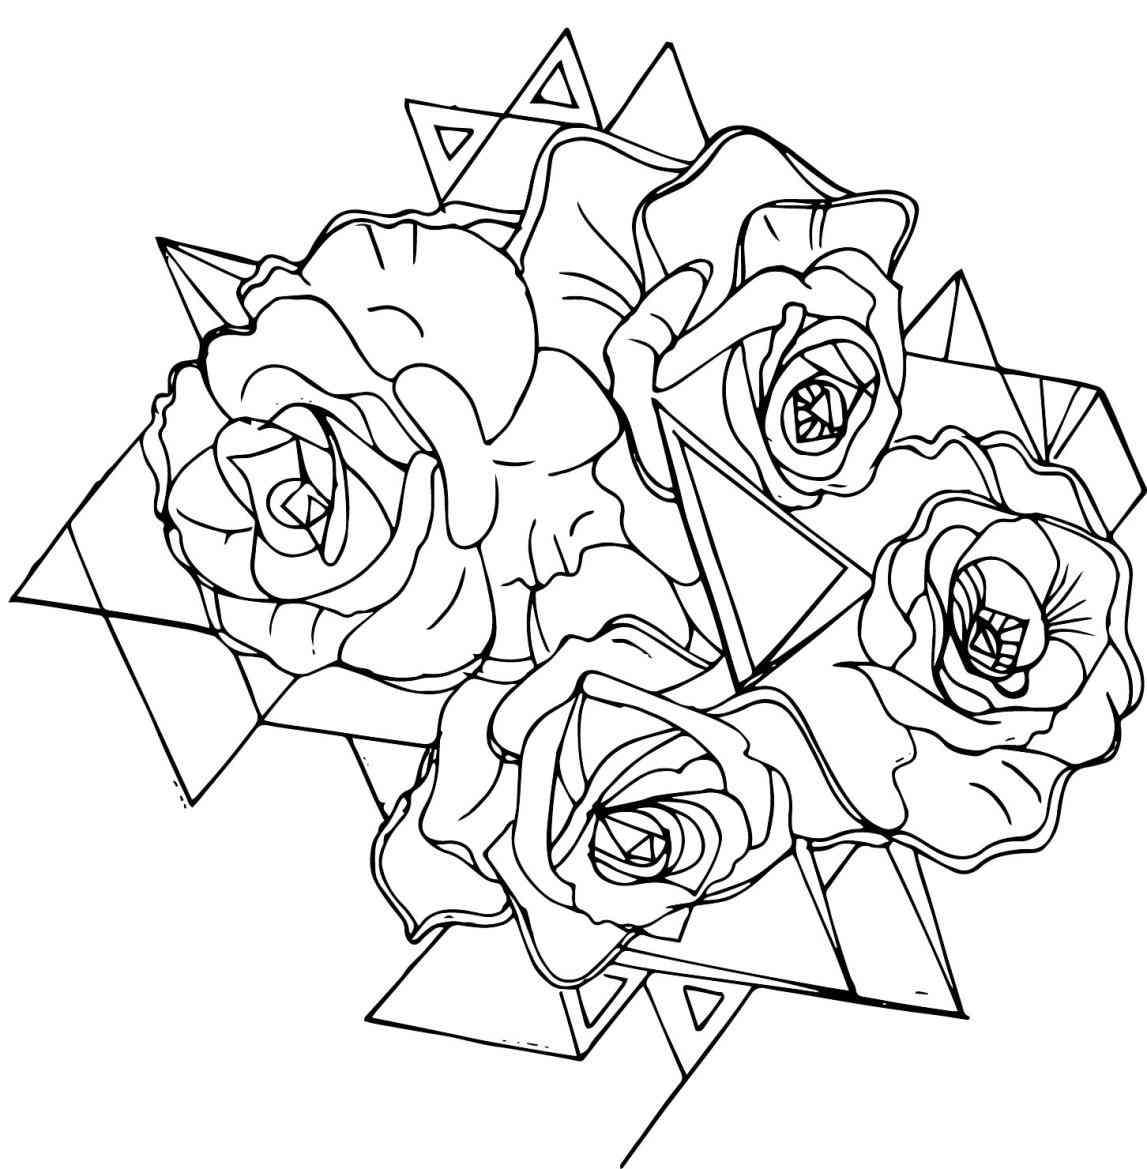 1147x1169 Rose Drawing Outline Drawing Rose Drawings Love Spells